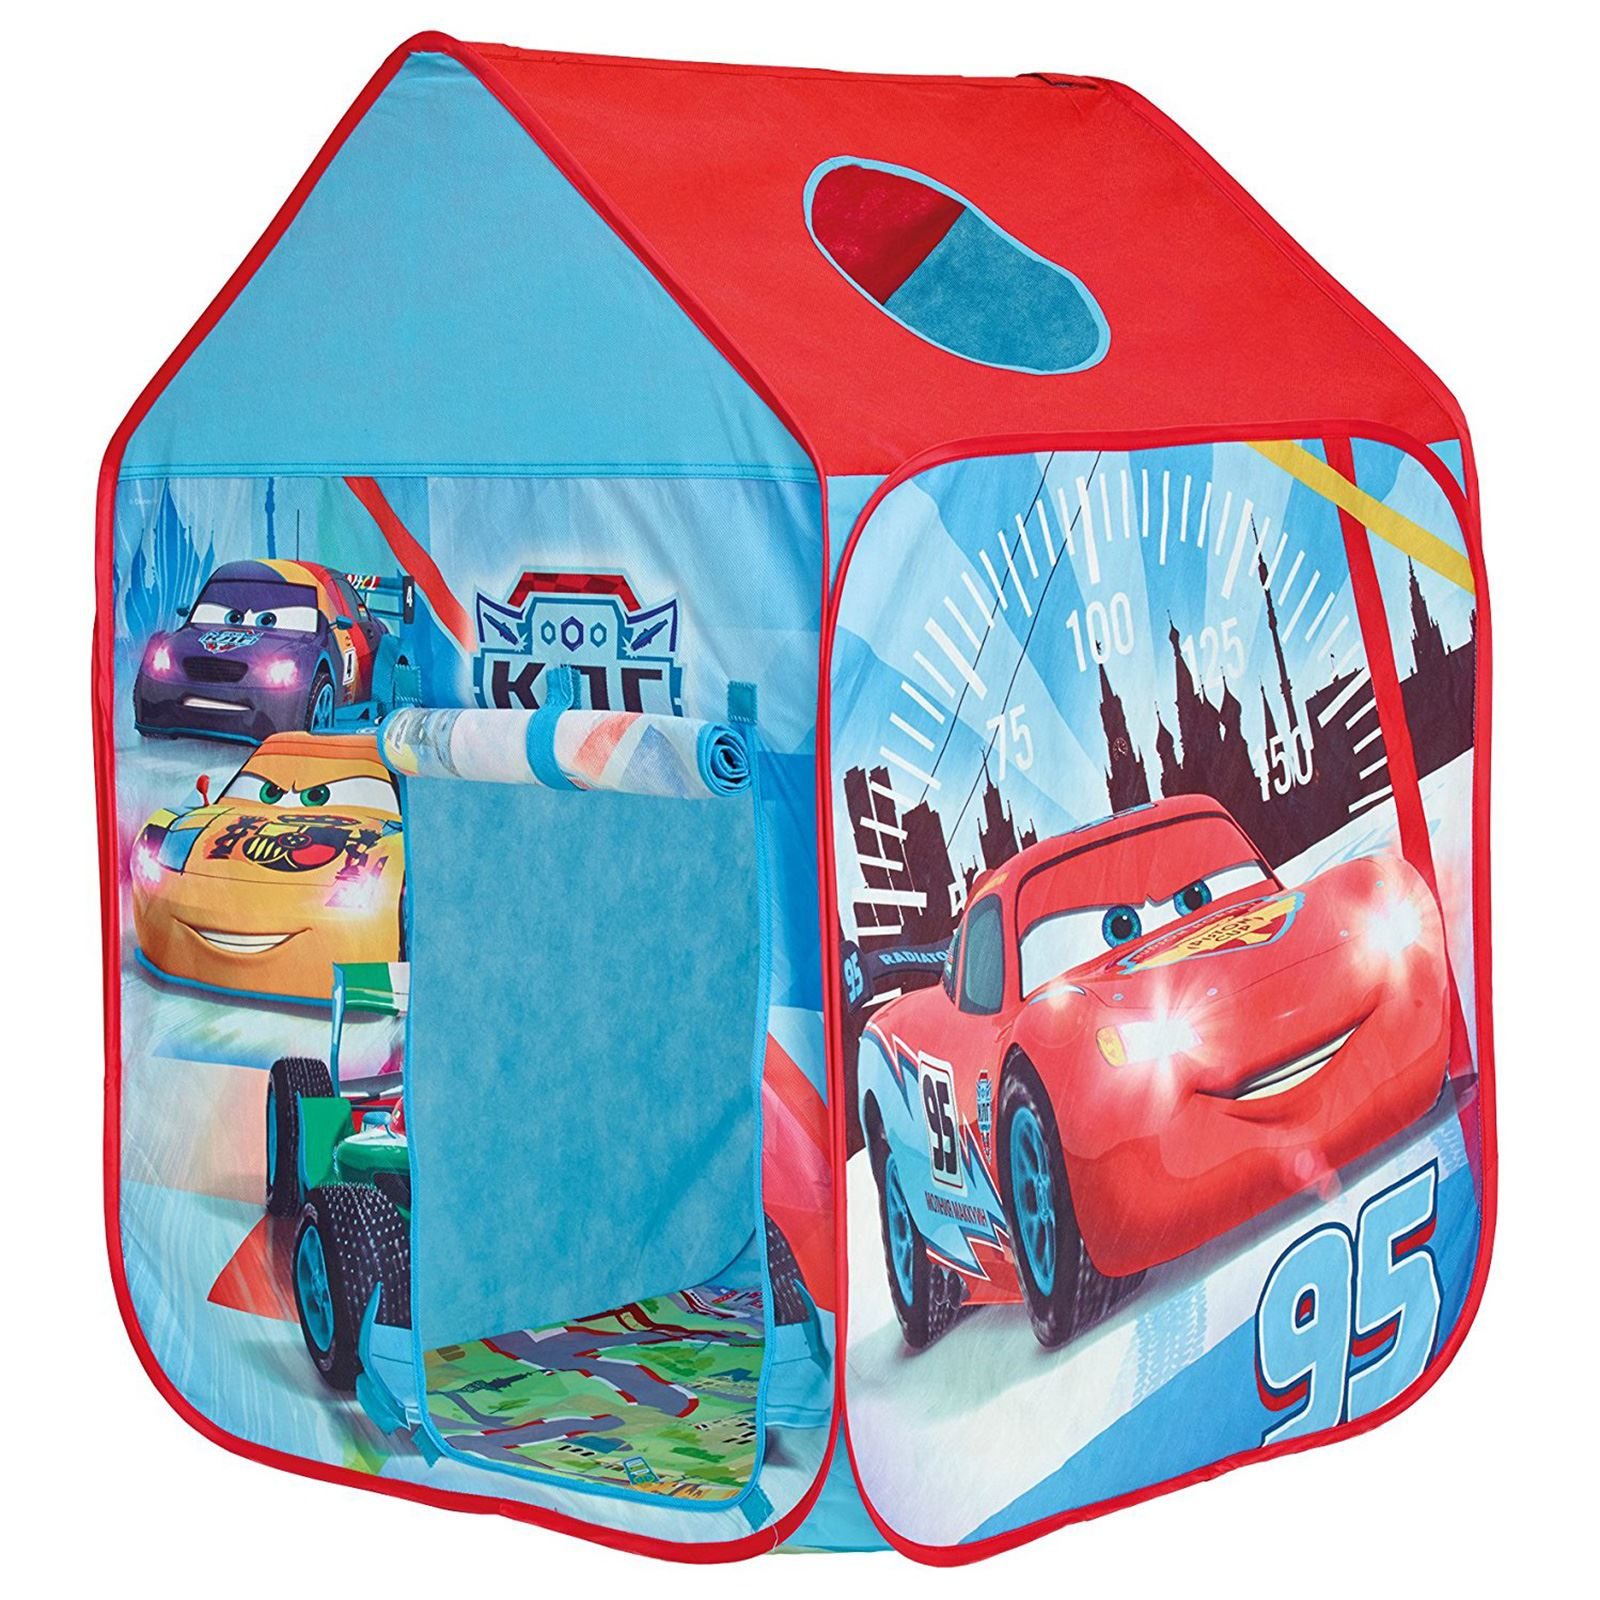 POP UP PLAY TENTS FEATURE KIDS DISNEY PRINCESS FROZEN CARS MINIONS FREE P+P  sc 1 st  eBay & POP UP PLAY TENTS FEATURE KIDS DISNEY PRINCESS FROZEN CARS ...